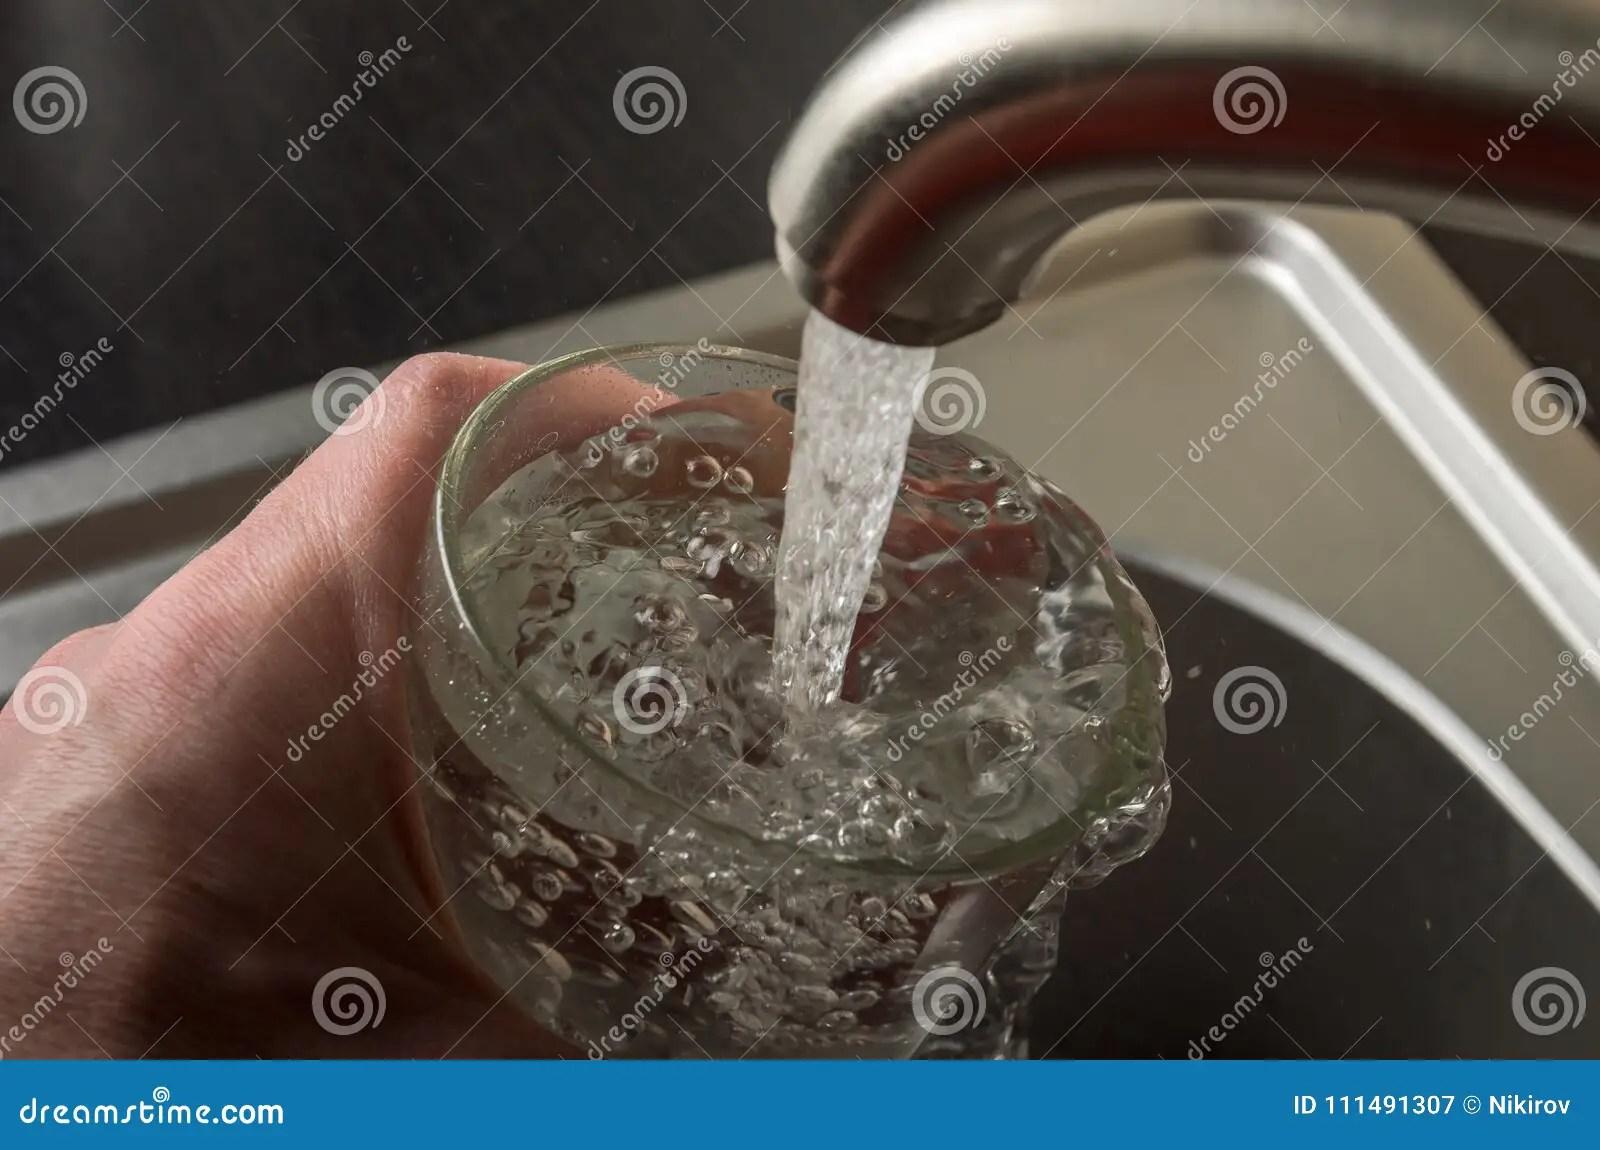 kitchen mixer cabinets for 一个人从厨房龙头下面采摘在玻璃的饮用水库存图片 图片包括有打赌的人 一个人从厨房龙头下面采摘在玻璃的饮用水